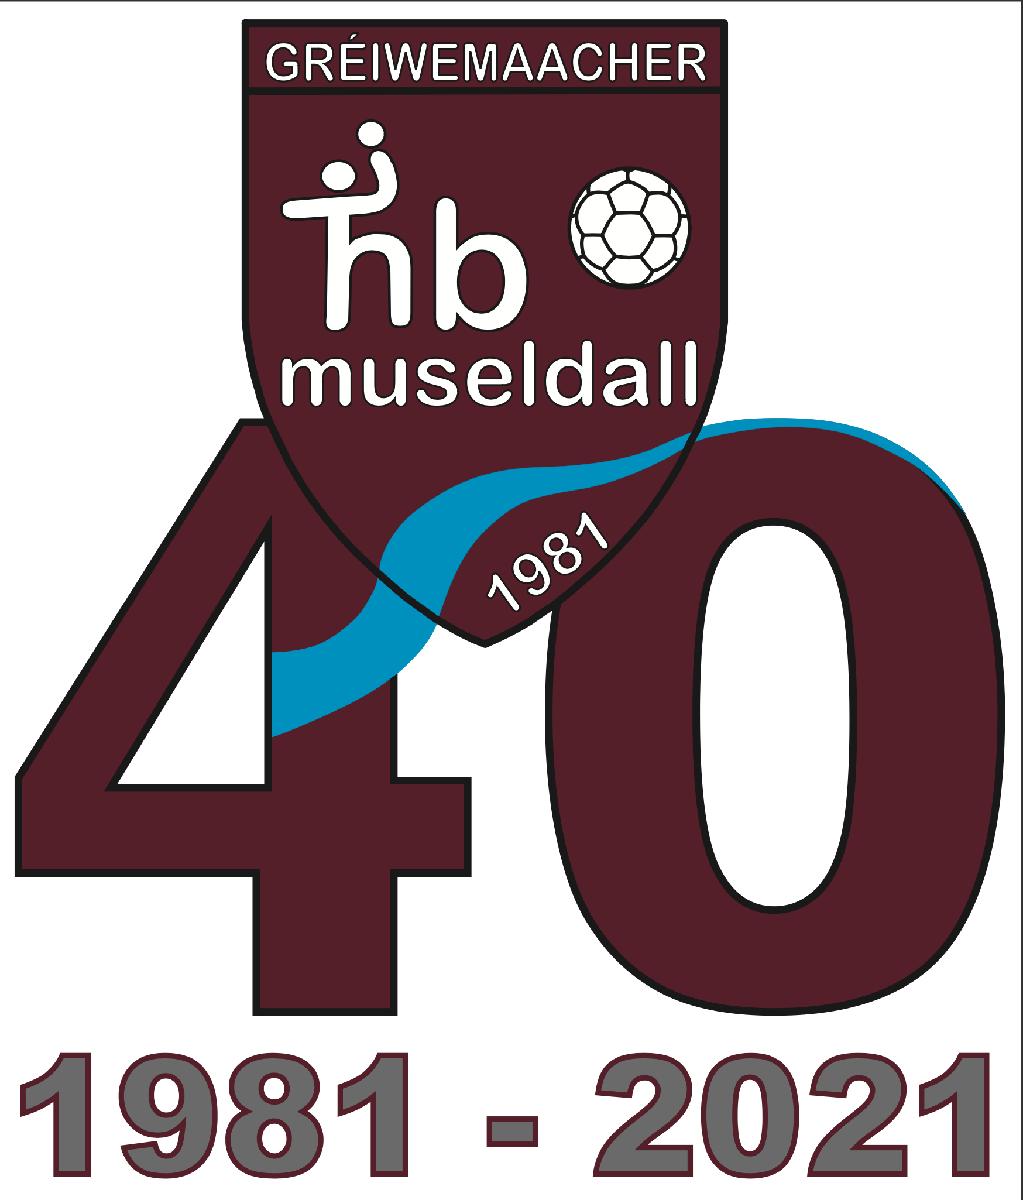 40 JOER HB MUSELDALL